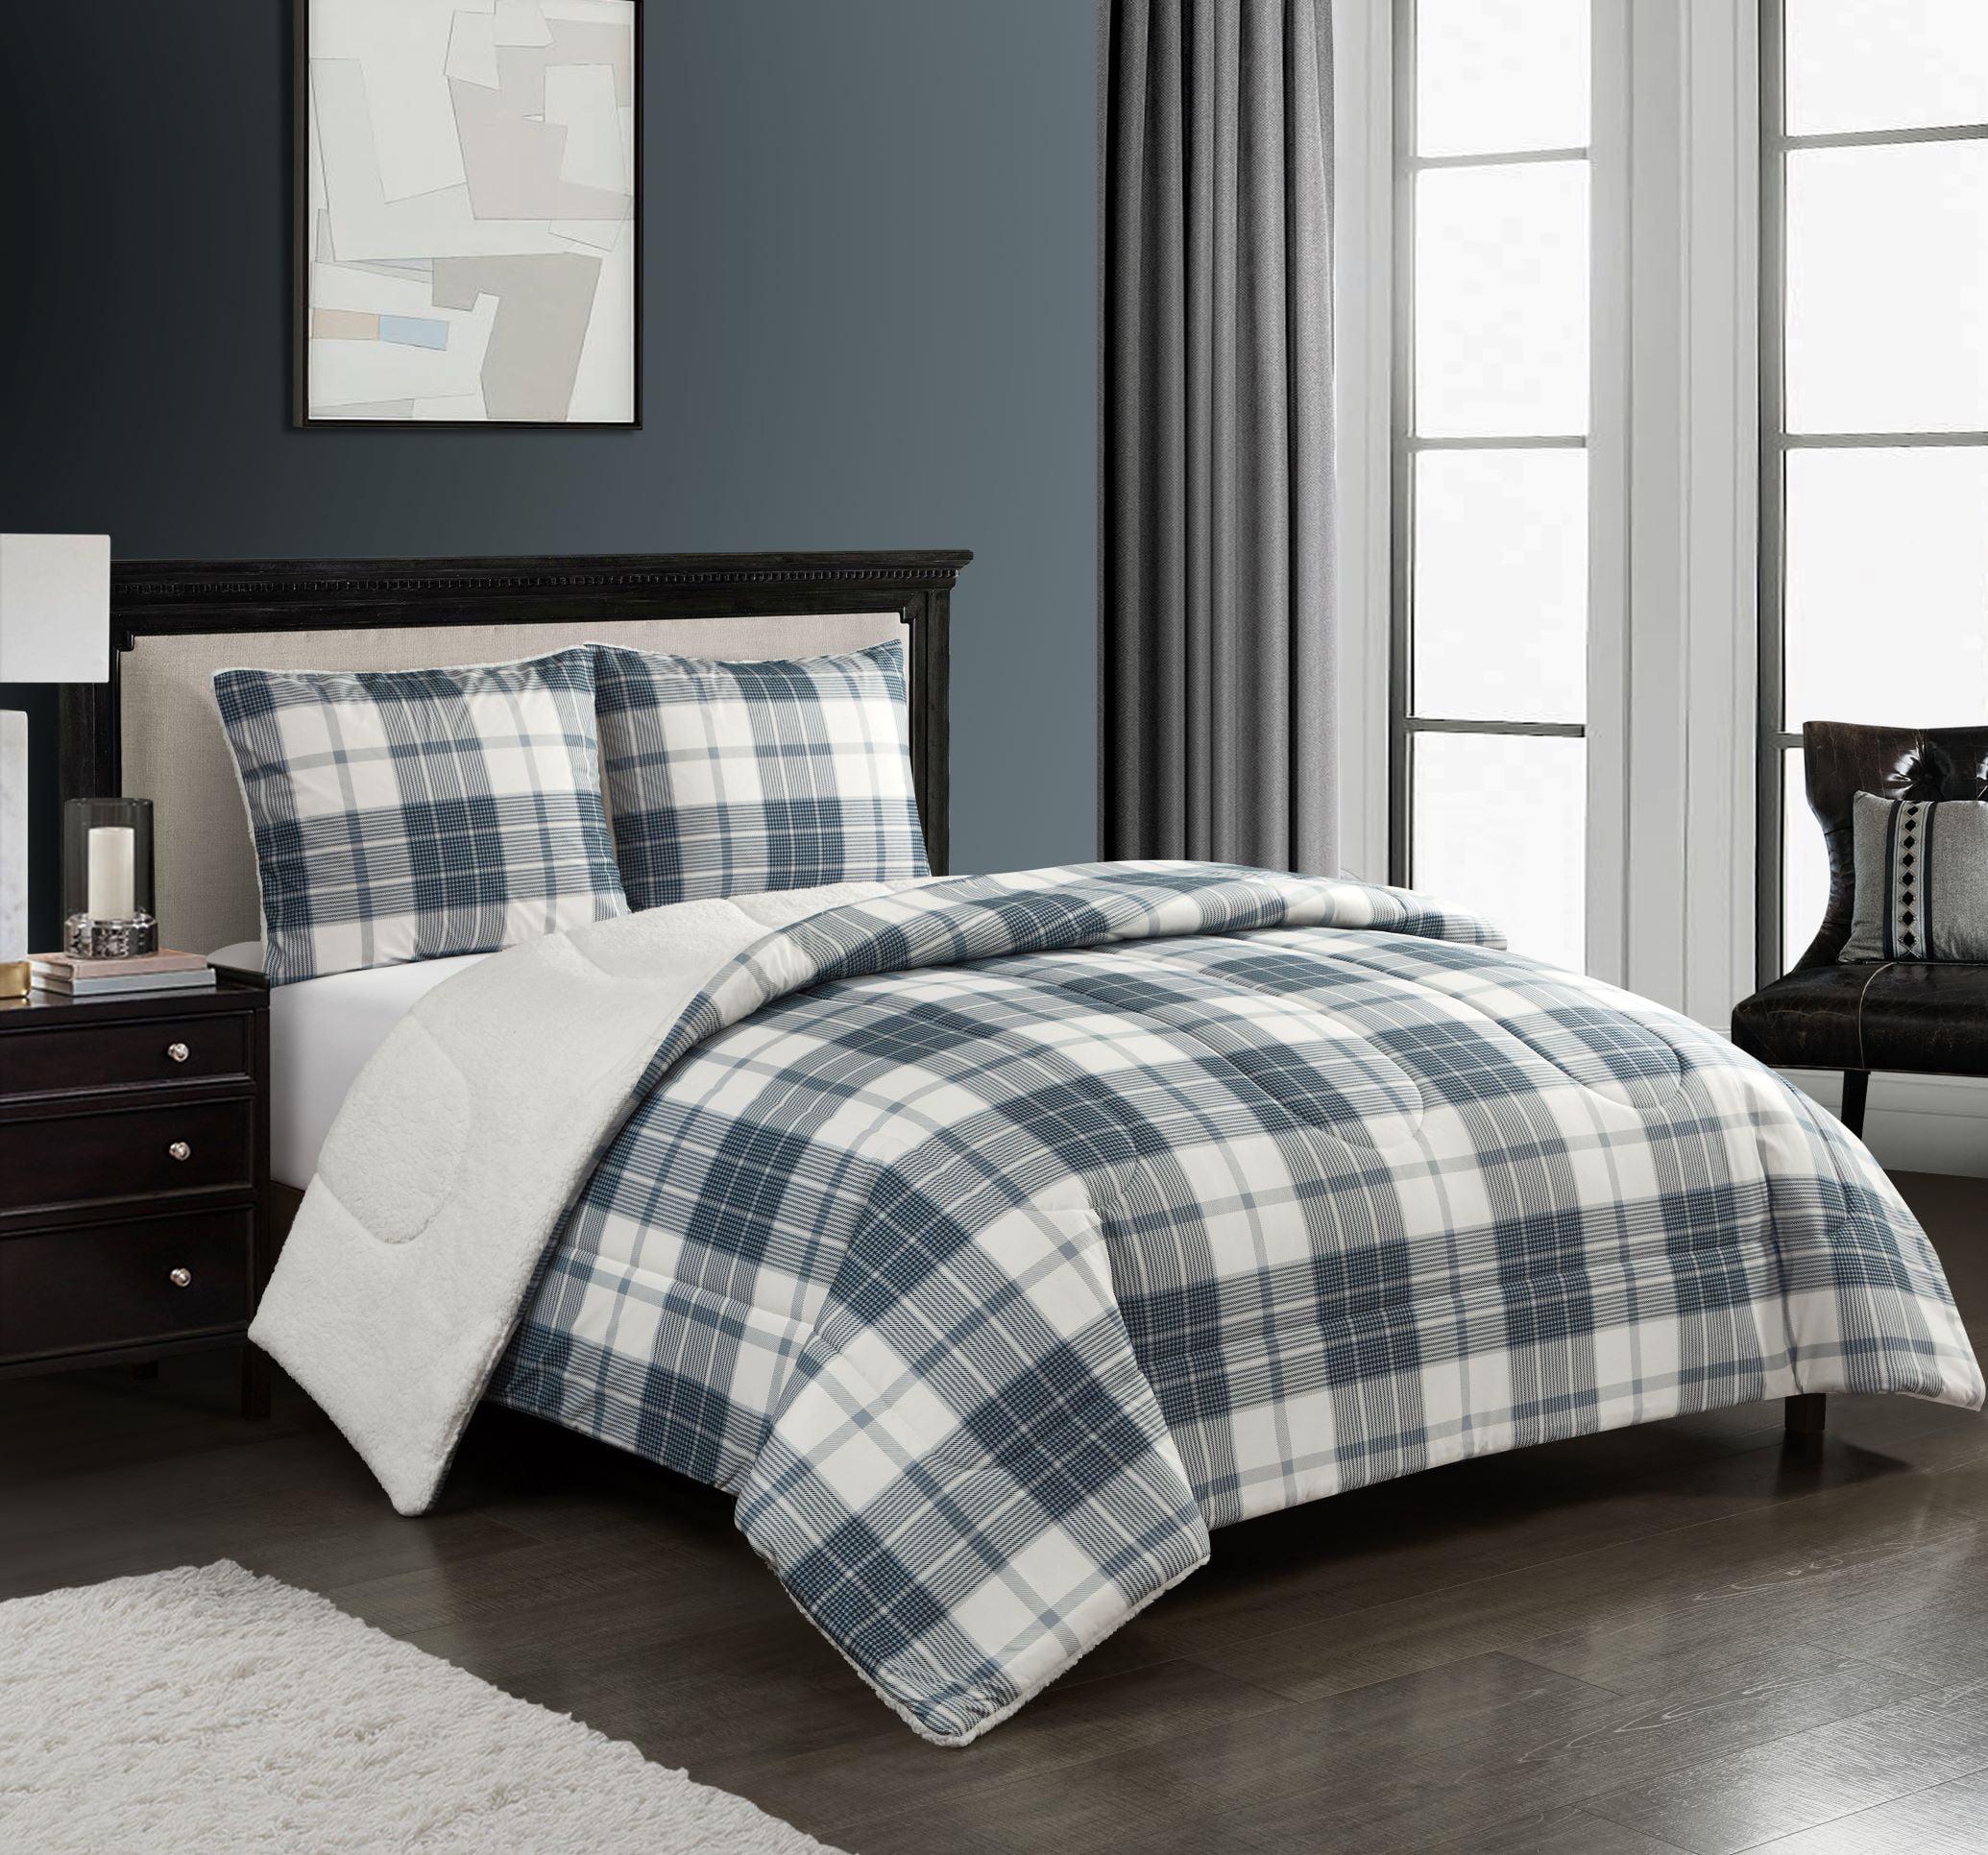 Mainstays Cozy Flannel Reverse To Super Soft Sherpa 3 Piece Comforter Set Full Queen Grey Plaid Walmart Com Walmart Com